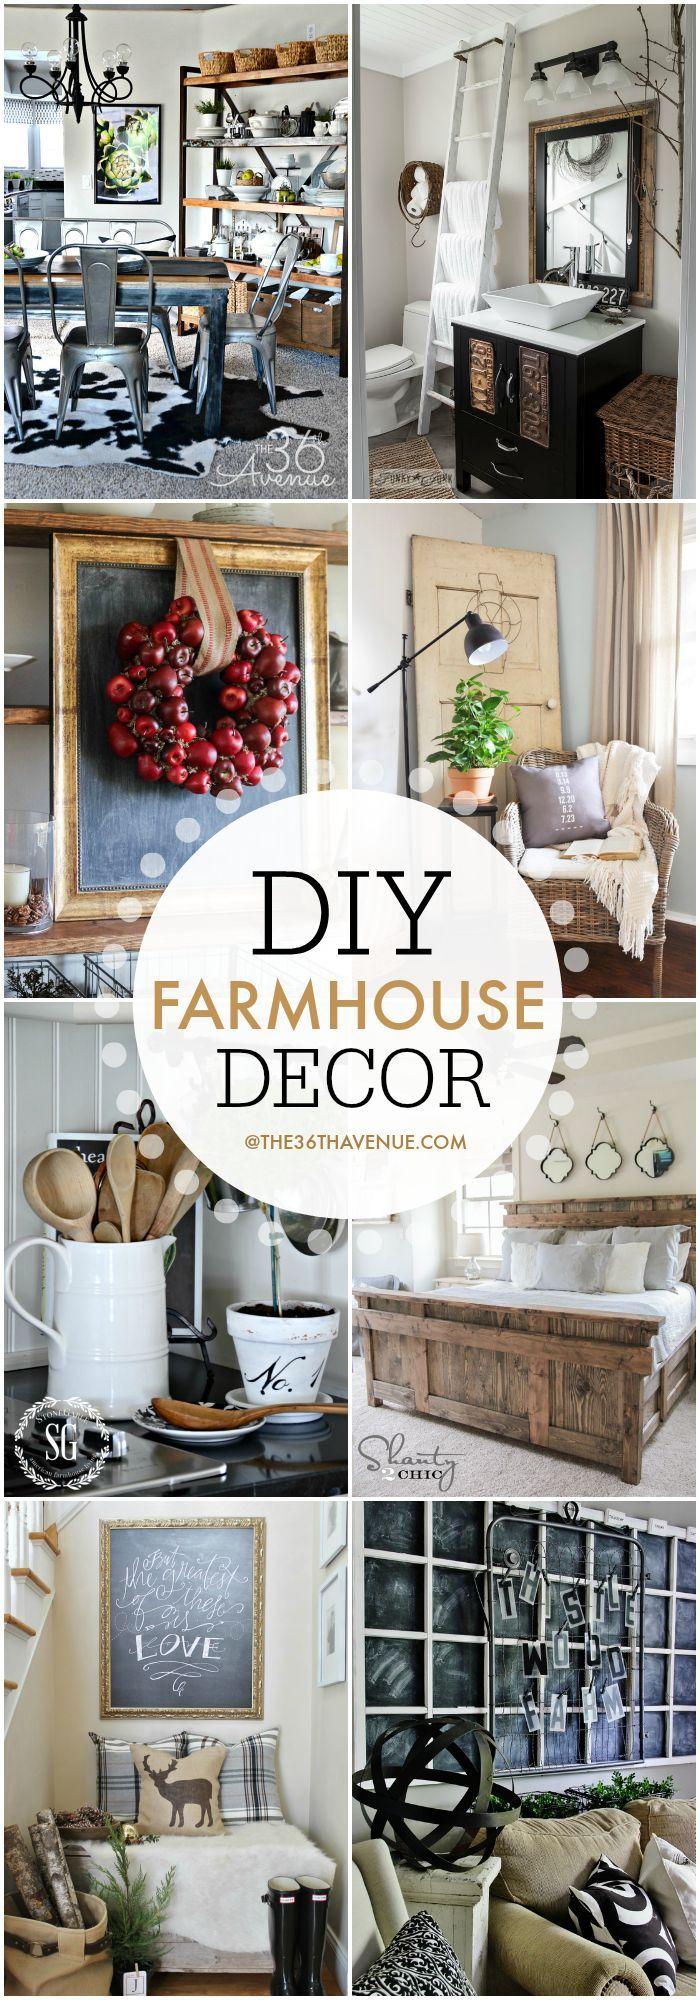 Farmhouse Home Decor Ideas Decorating, House and